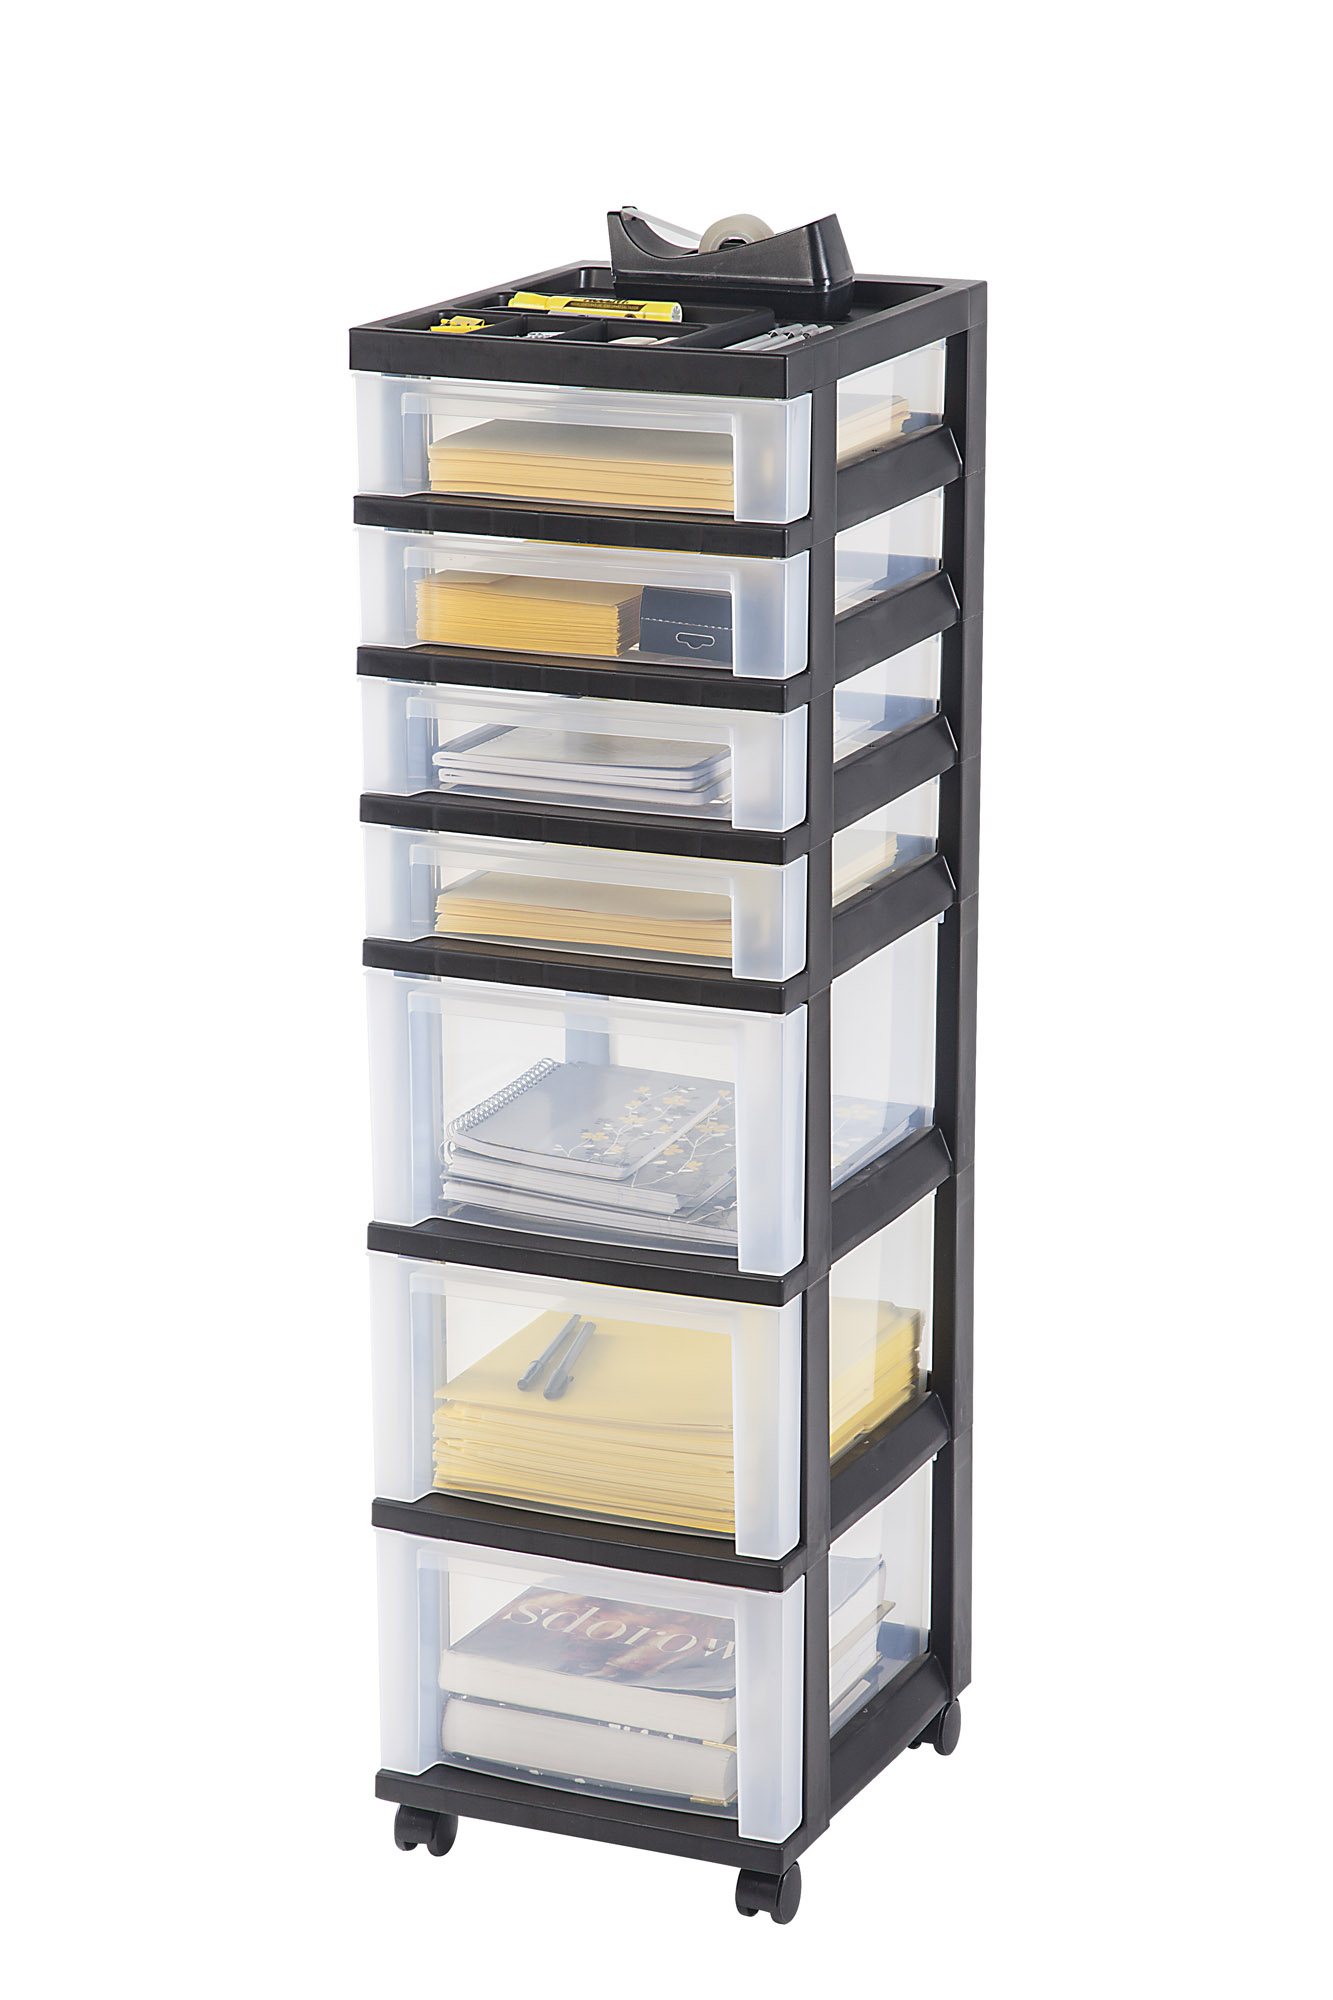 IRIS 7-Drawer Rolling Storage Cart with Organizer Top, Black by IRIS USA, Inc.